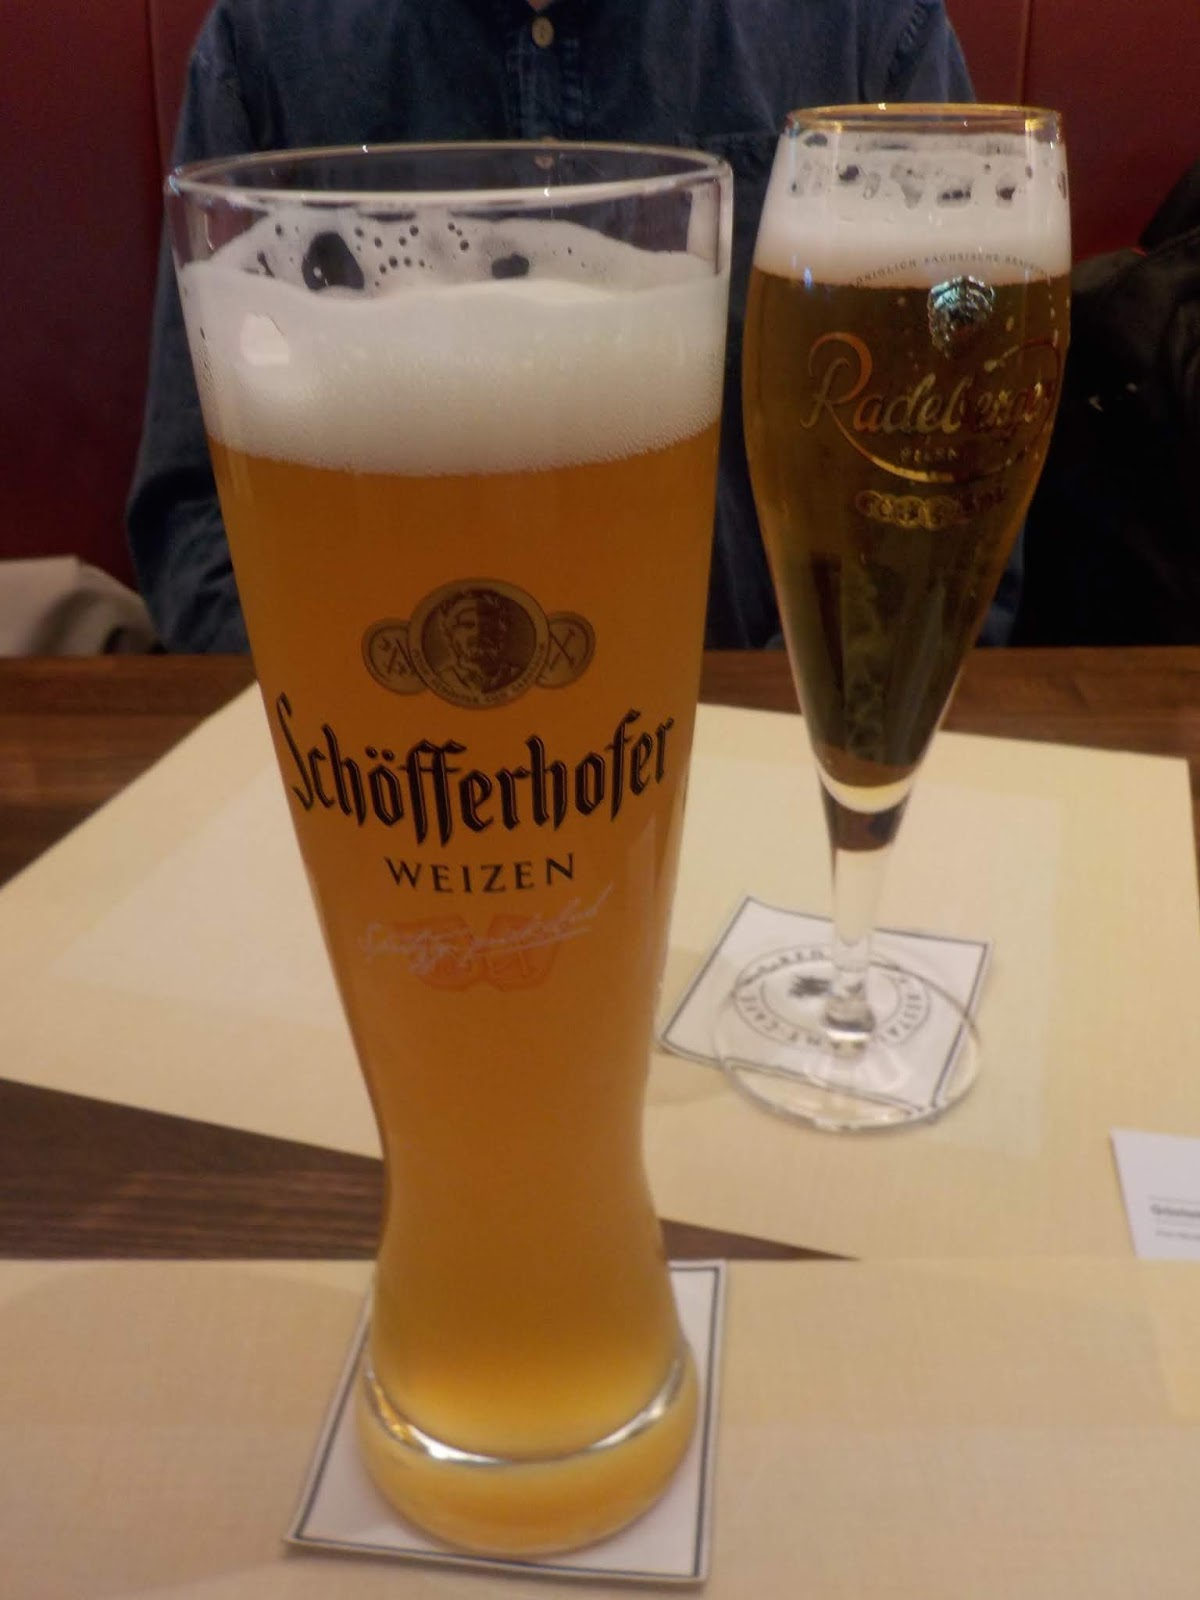 For Some Years, Schoefferhofer Weizenbier Has Been My Favourite